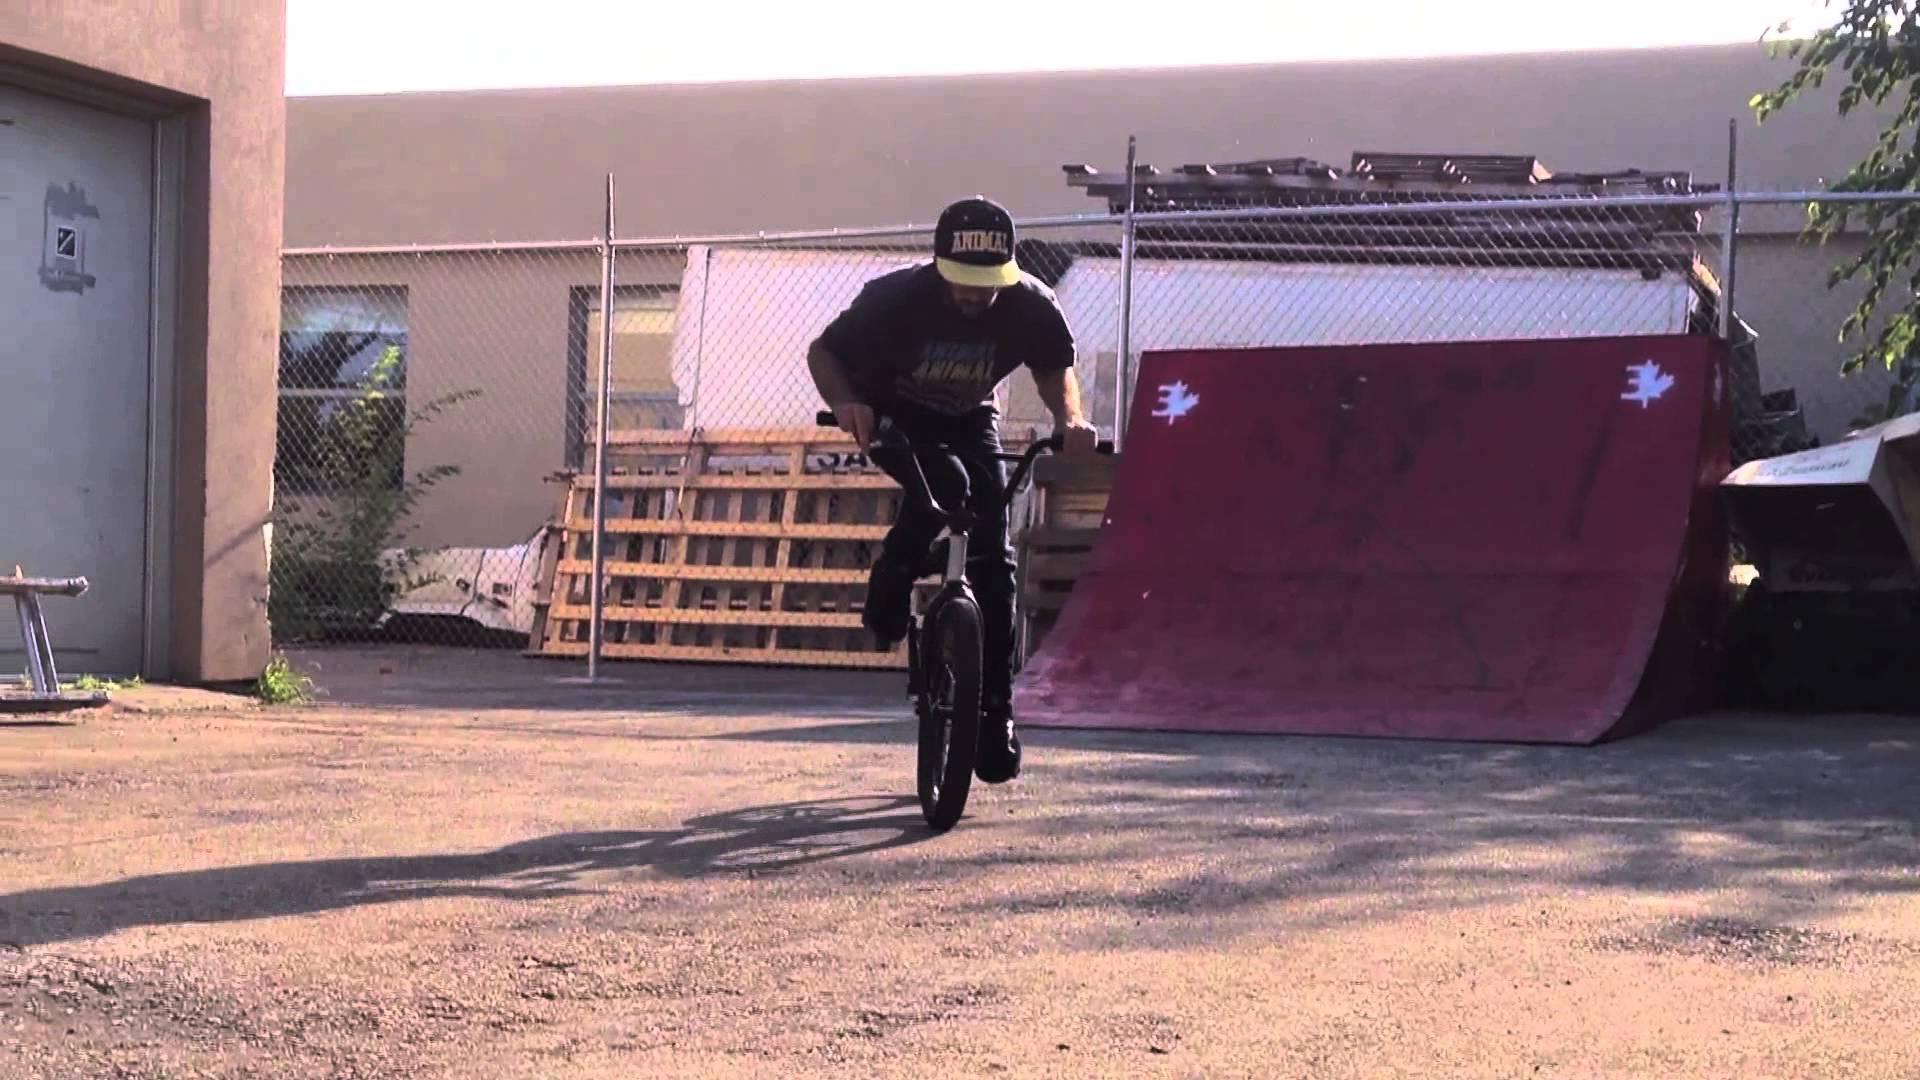 Chris Silva & Steve Moxley – 3Ride Ramp